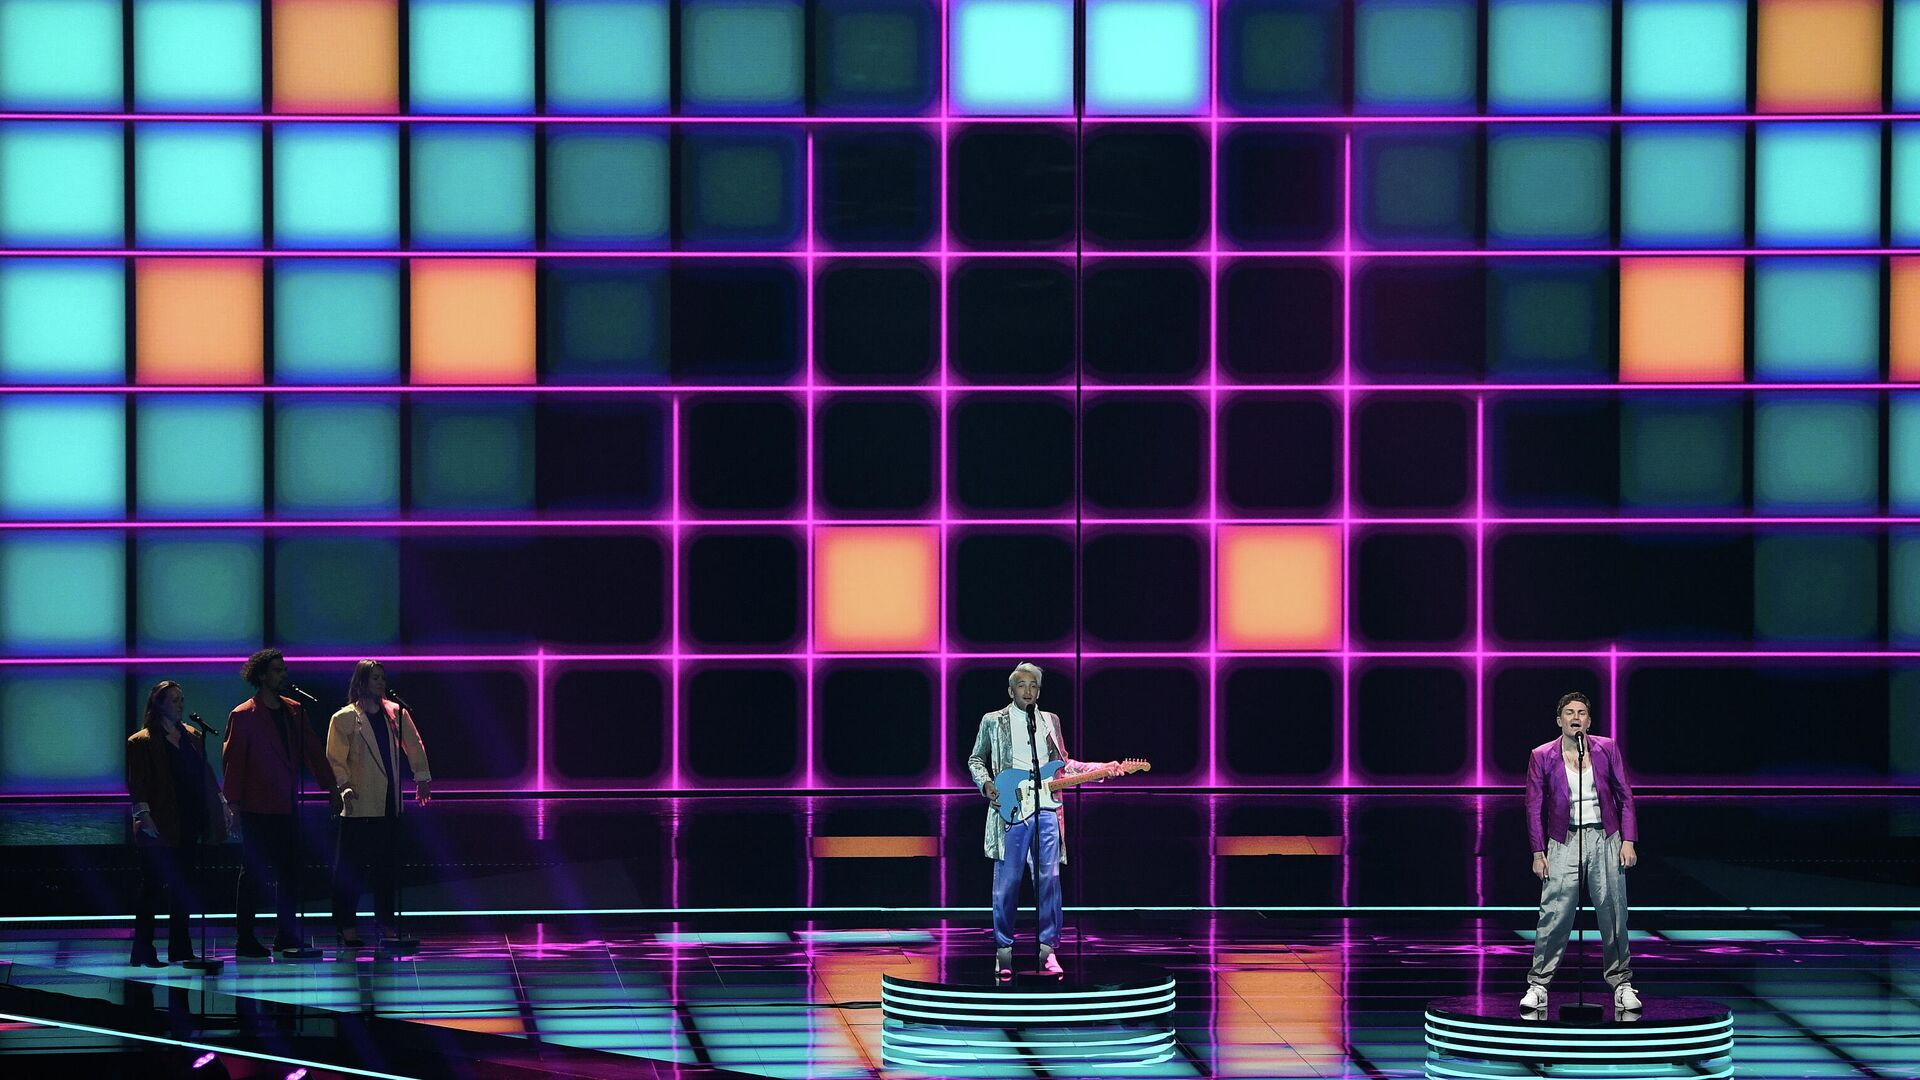 Eurovision 2022 - Sputnik Italia, 1920, 21.05.2021